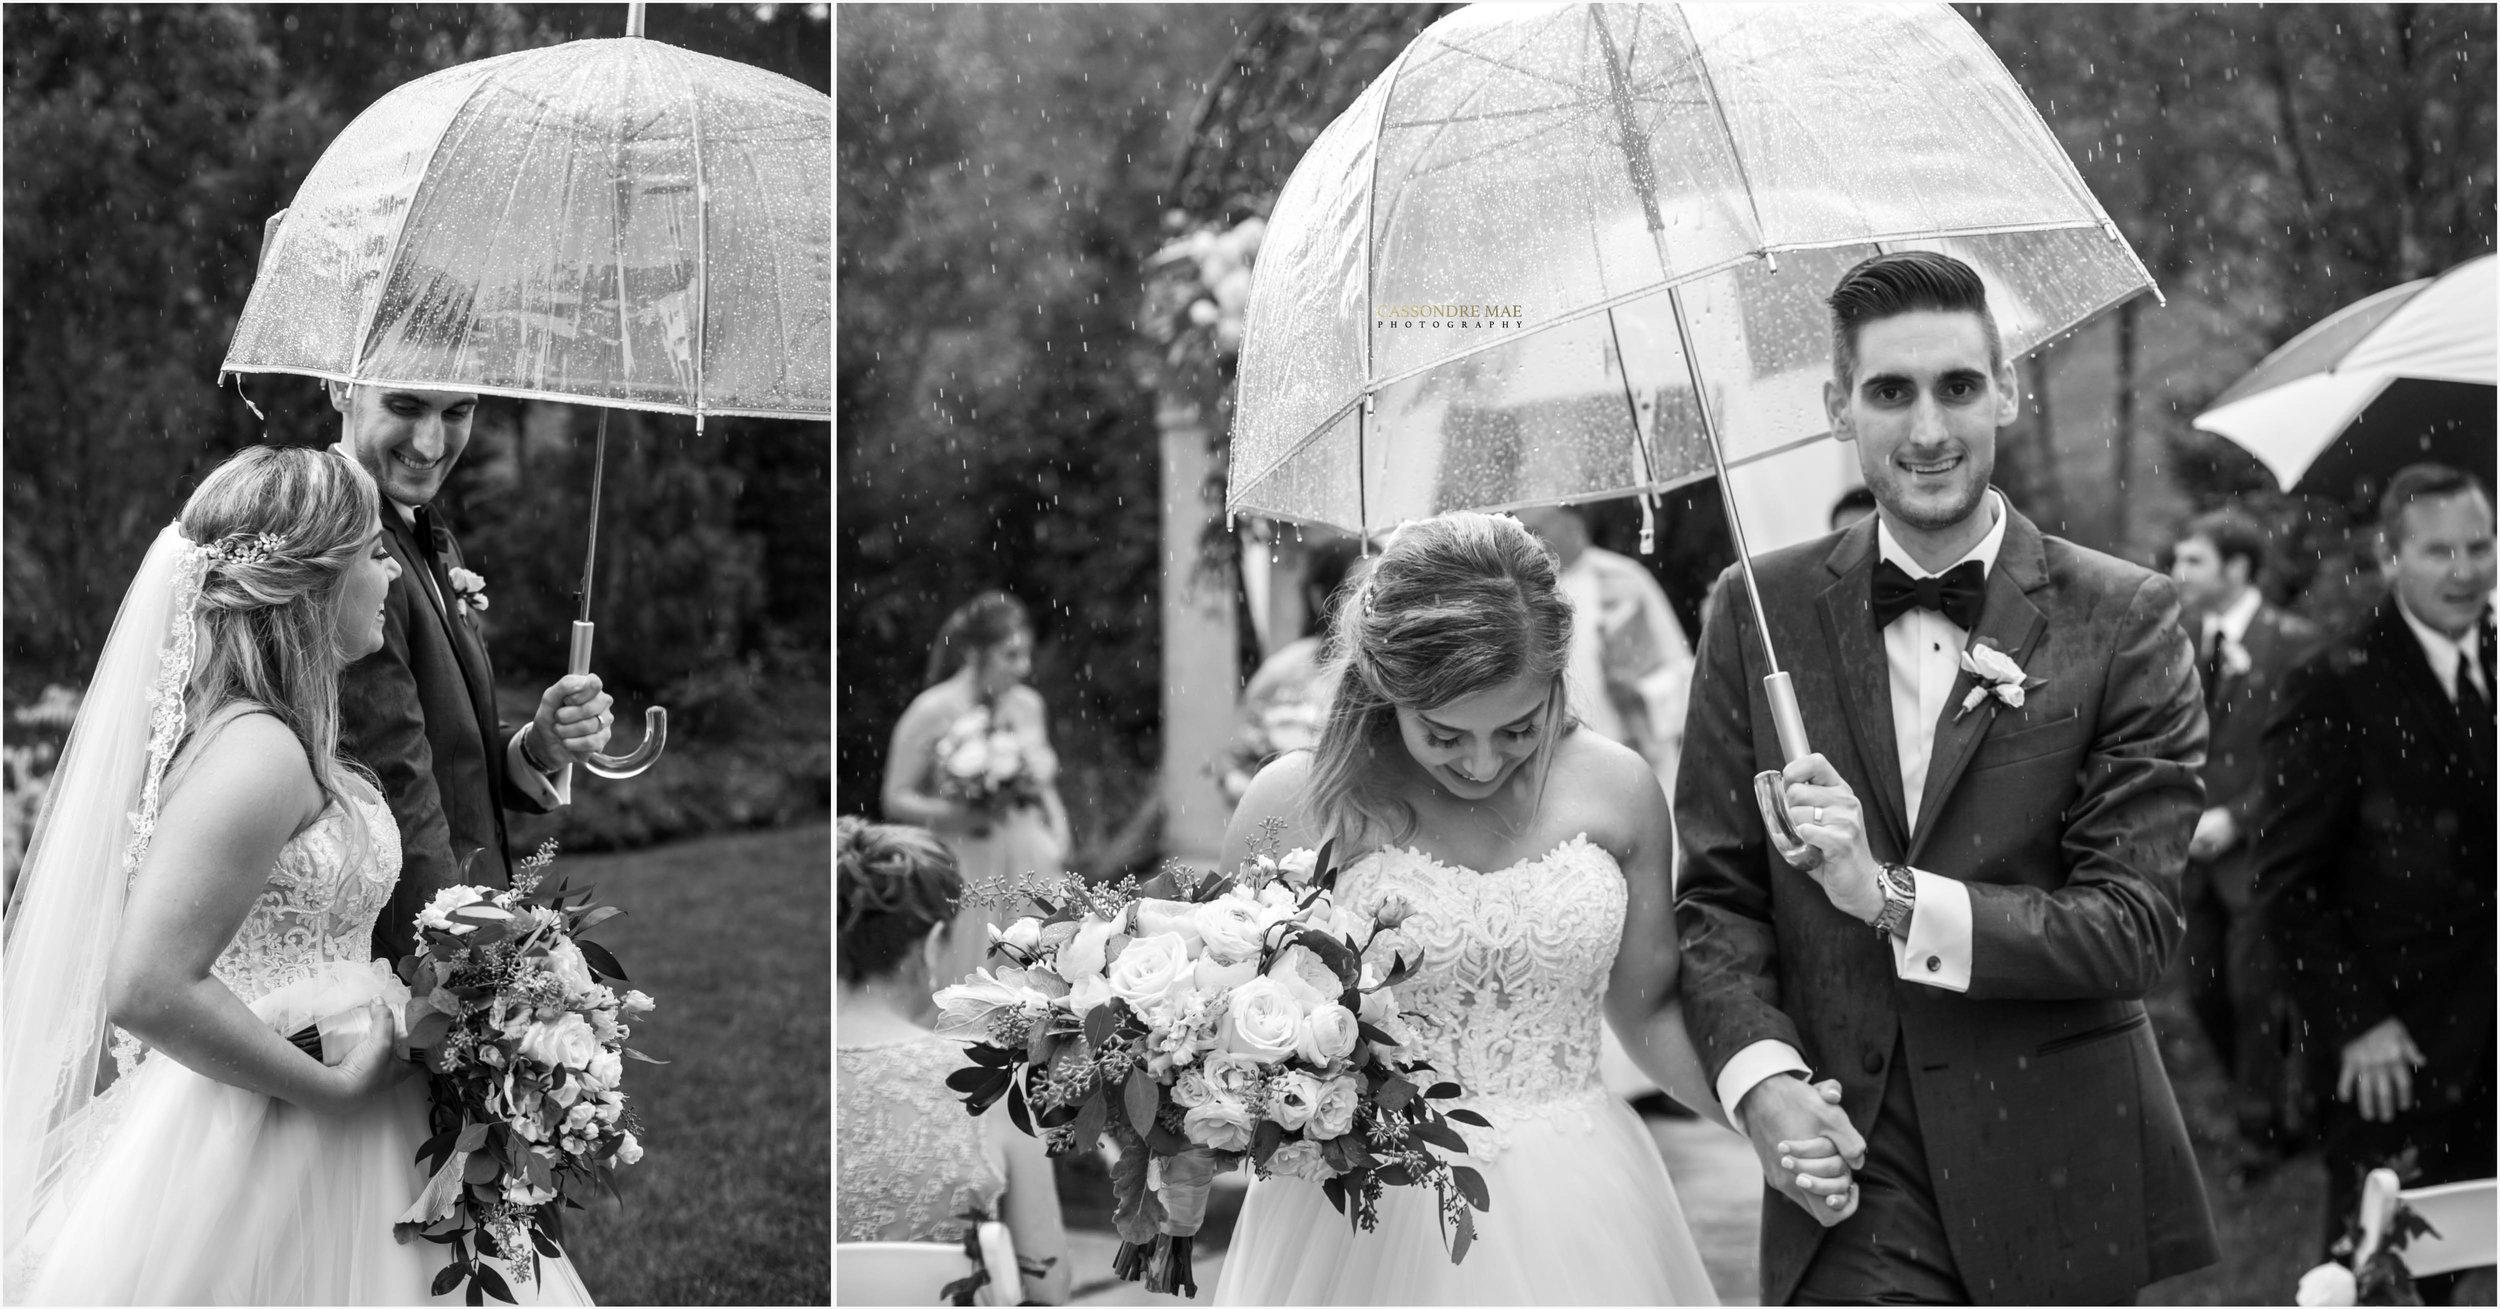 Cassondre Mae Photography Hudson Valley NY Wedding Photographer -27.jpg